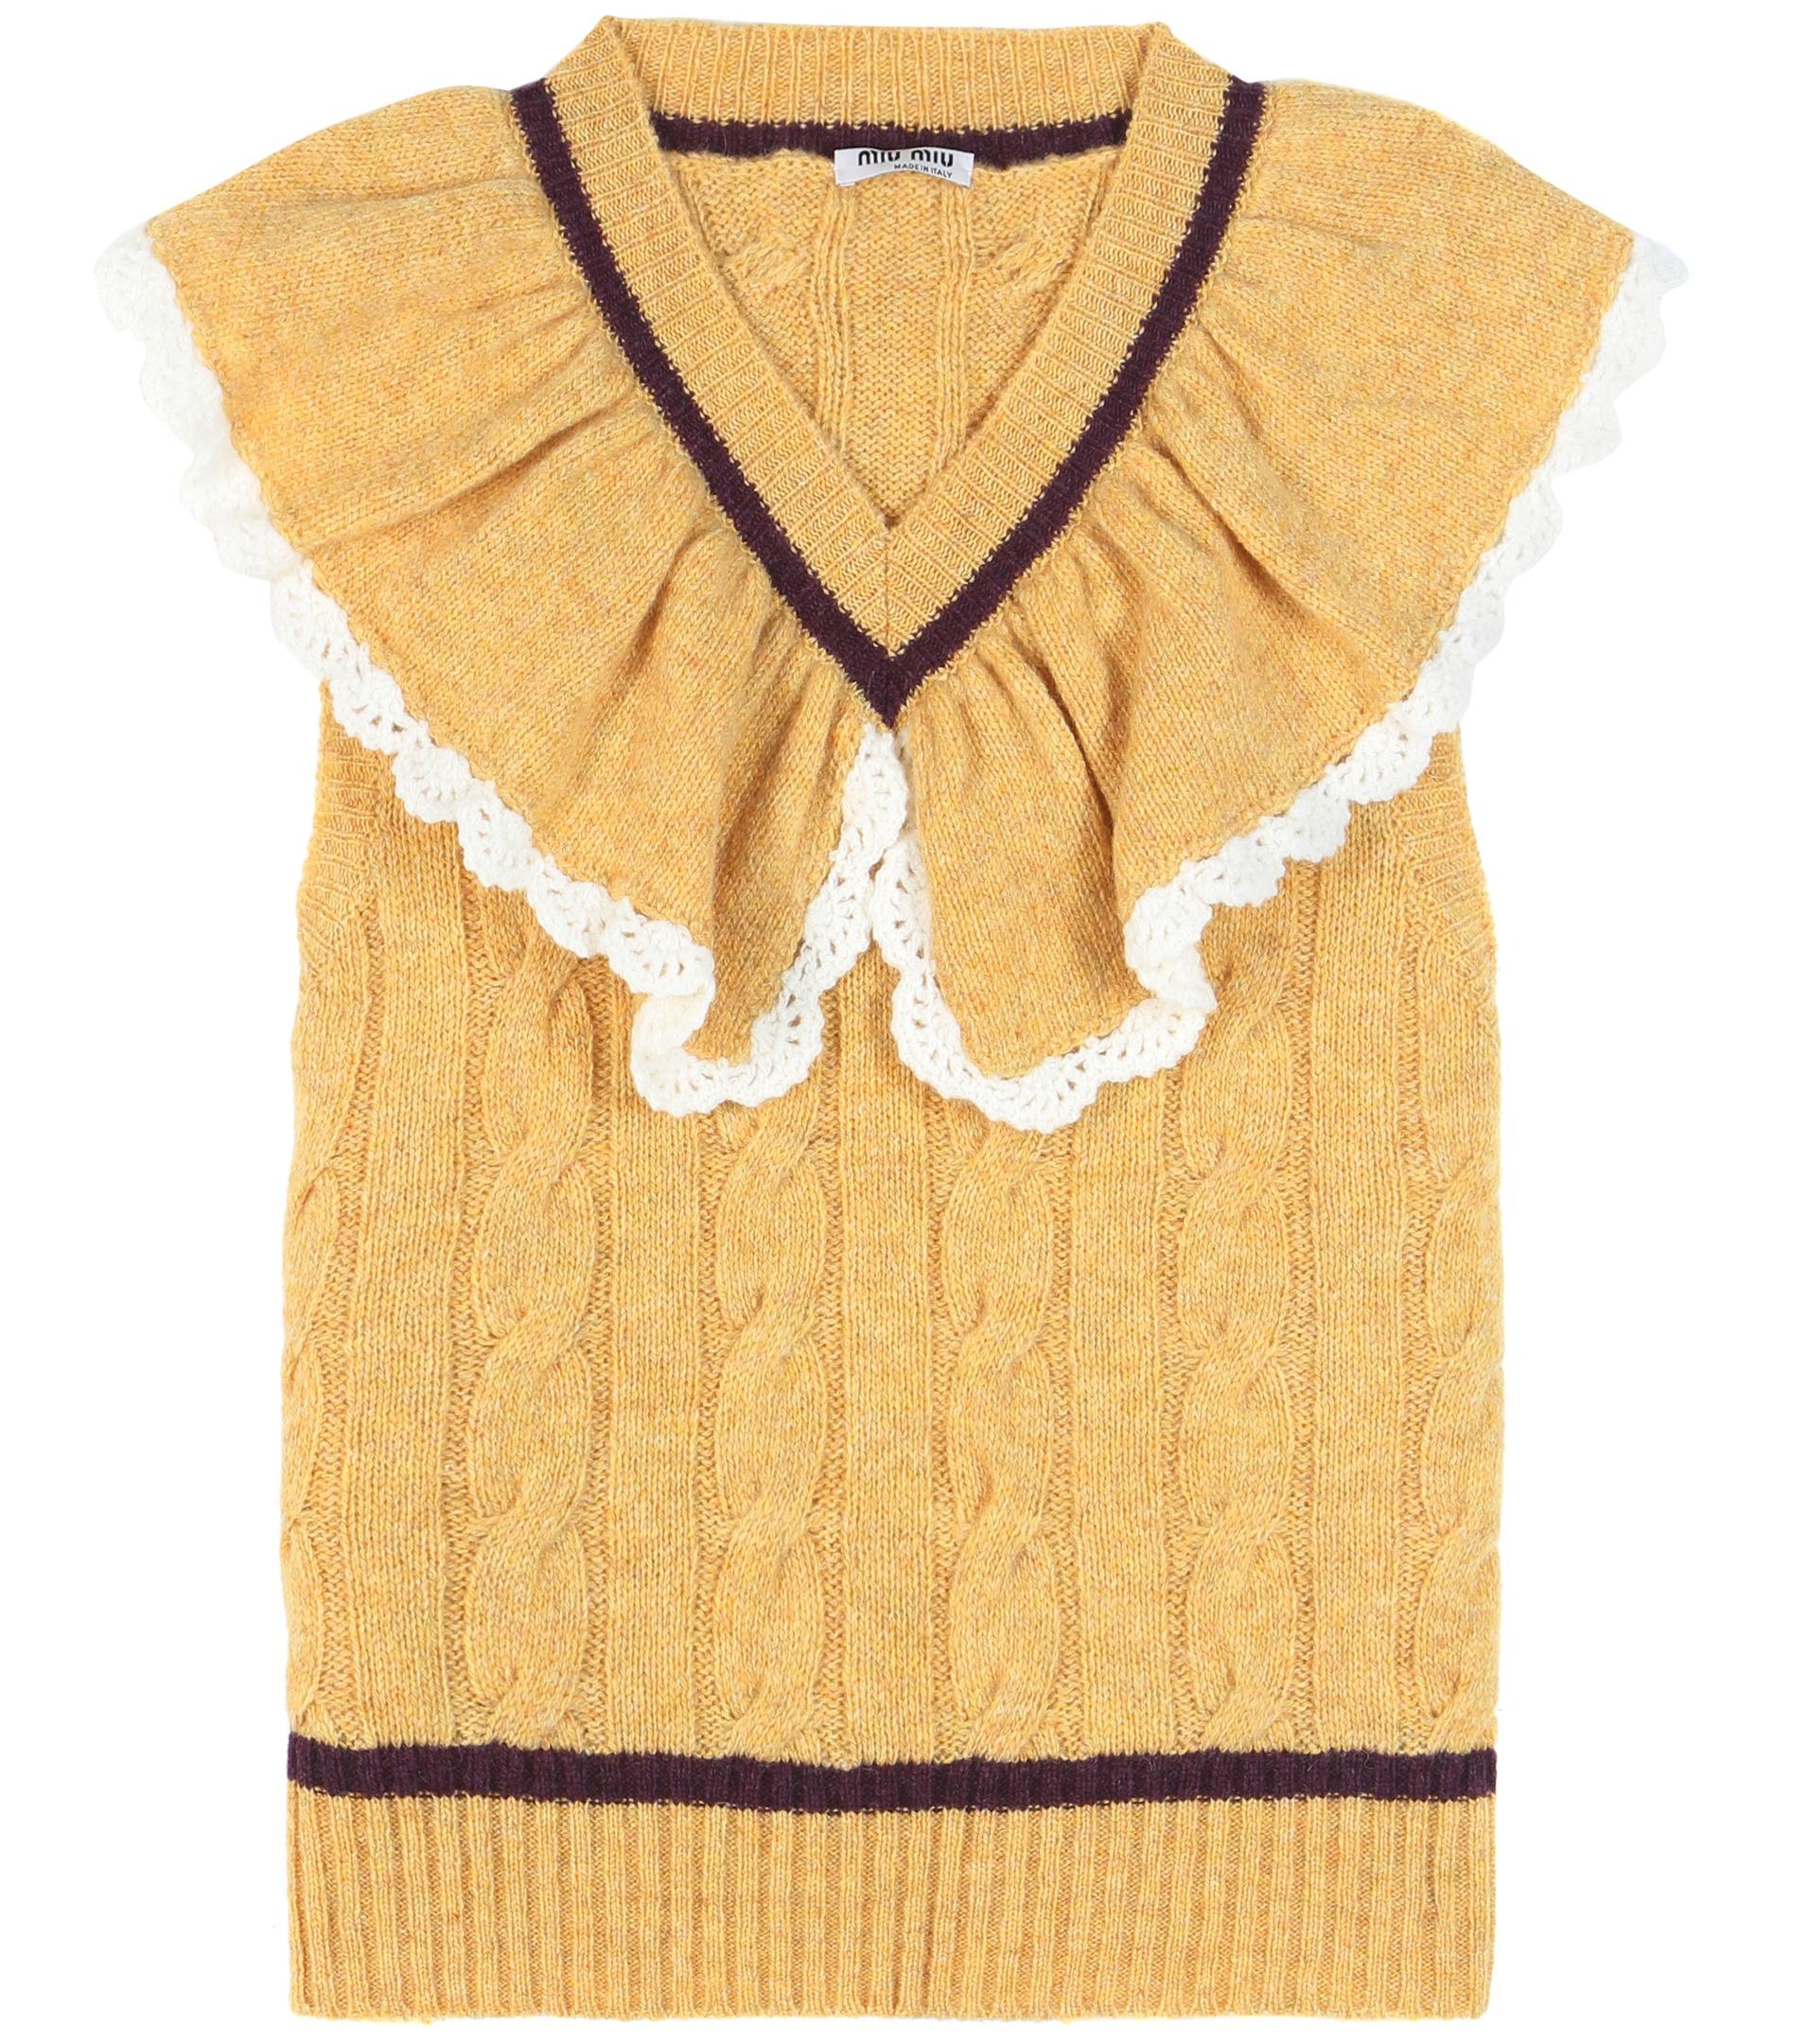 Miu miu Ruffled Wool Sweater Vest in Yellow | Lyst